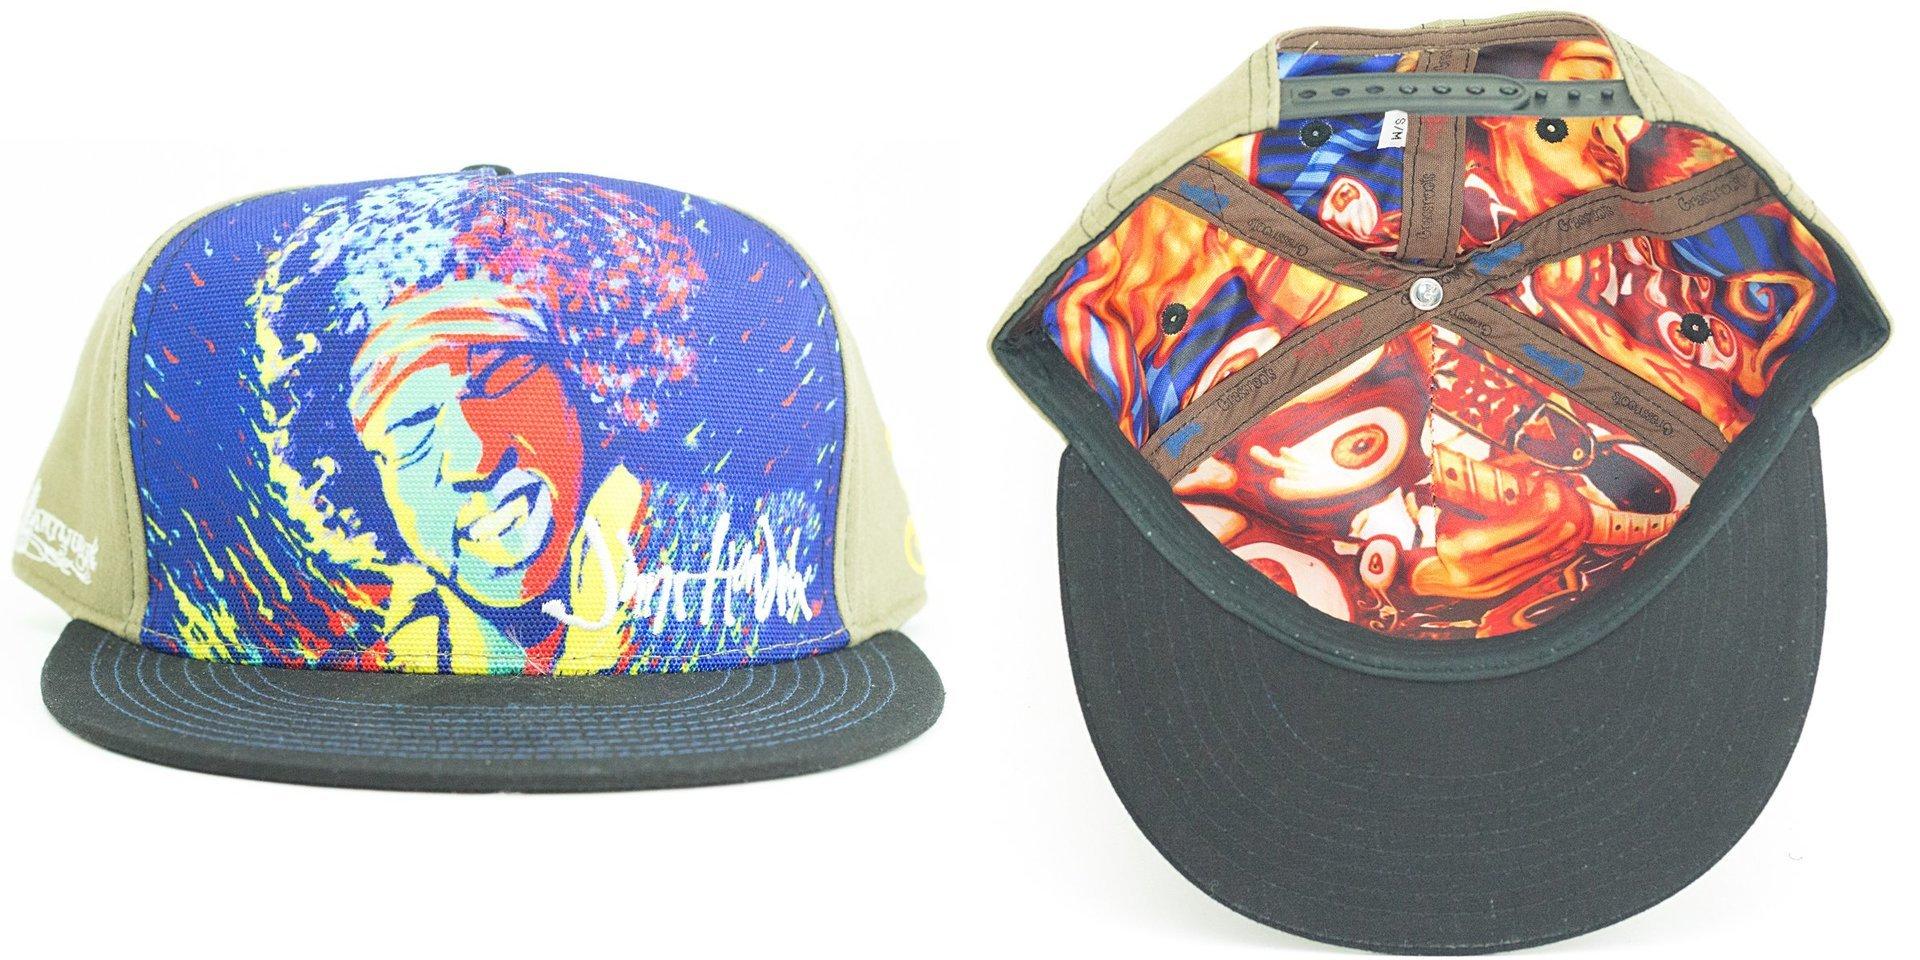 Jimi Hendrix Paint Shallow Snapback Grassroots California Hat